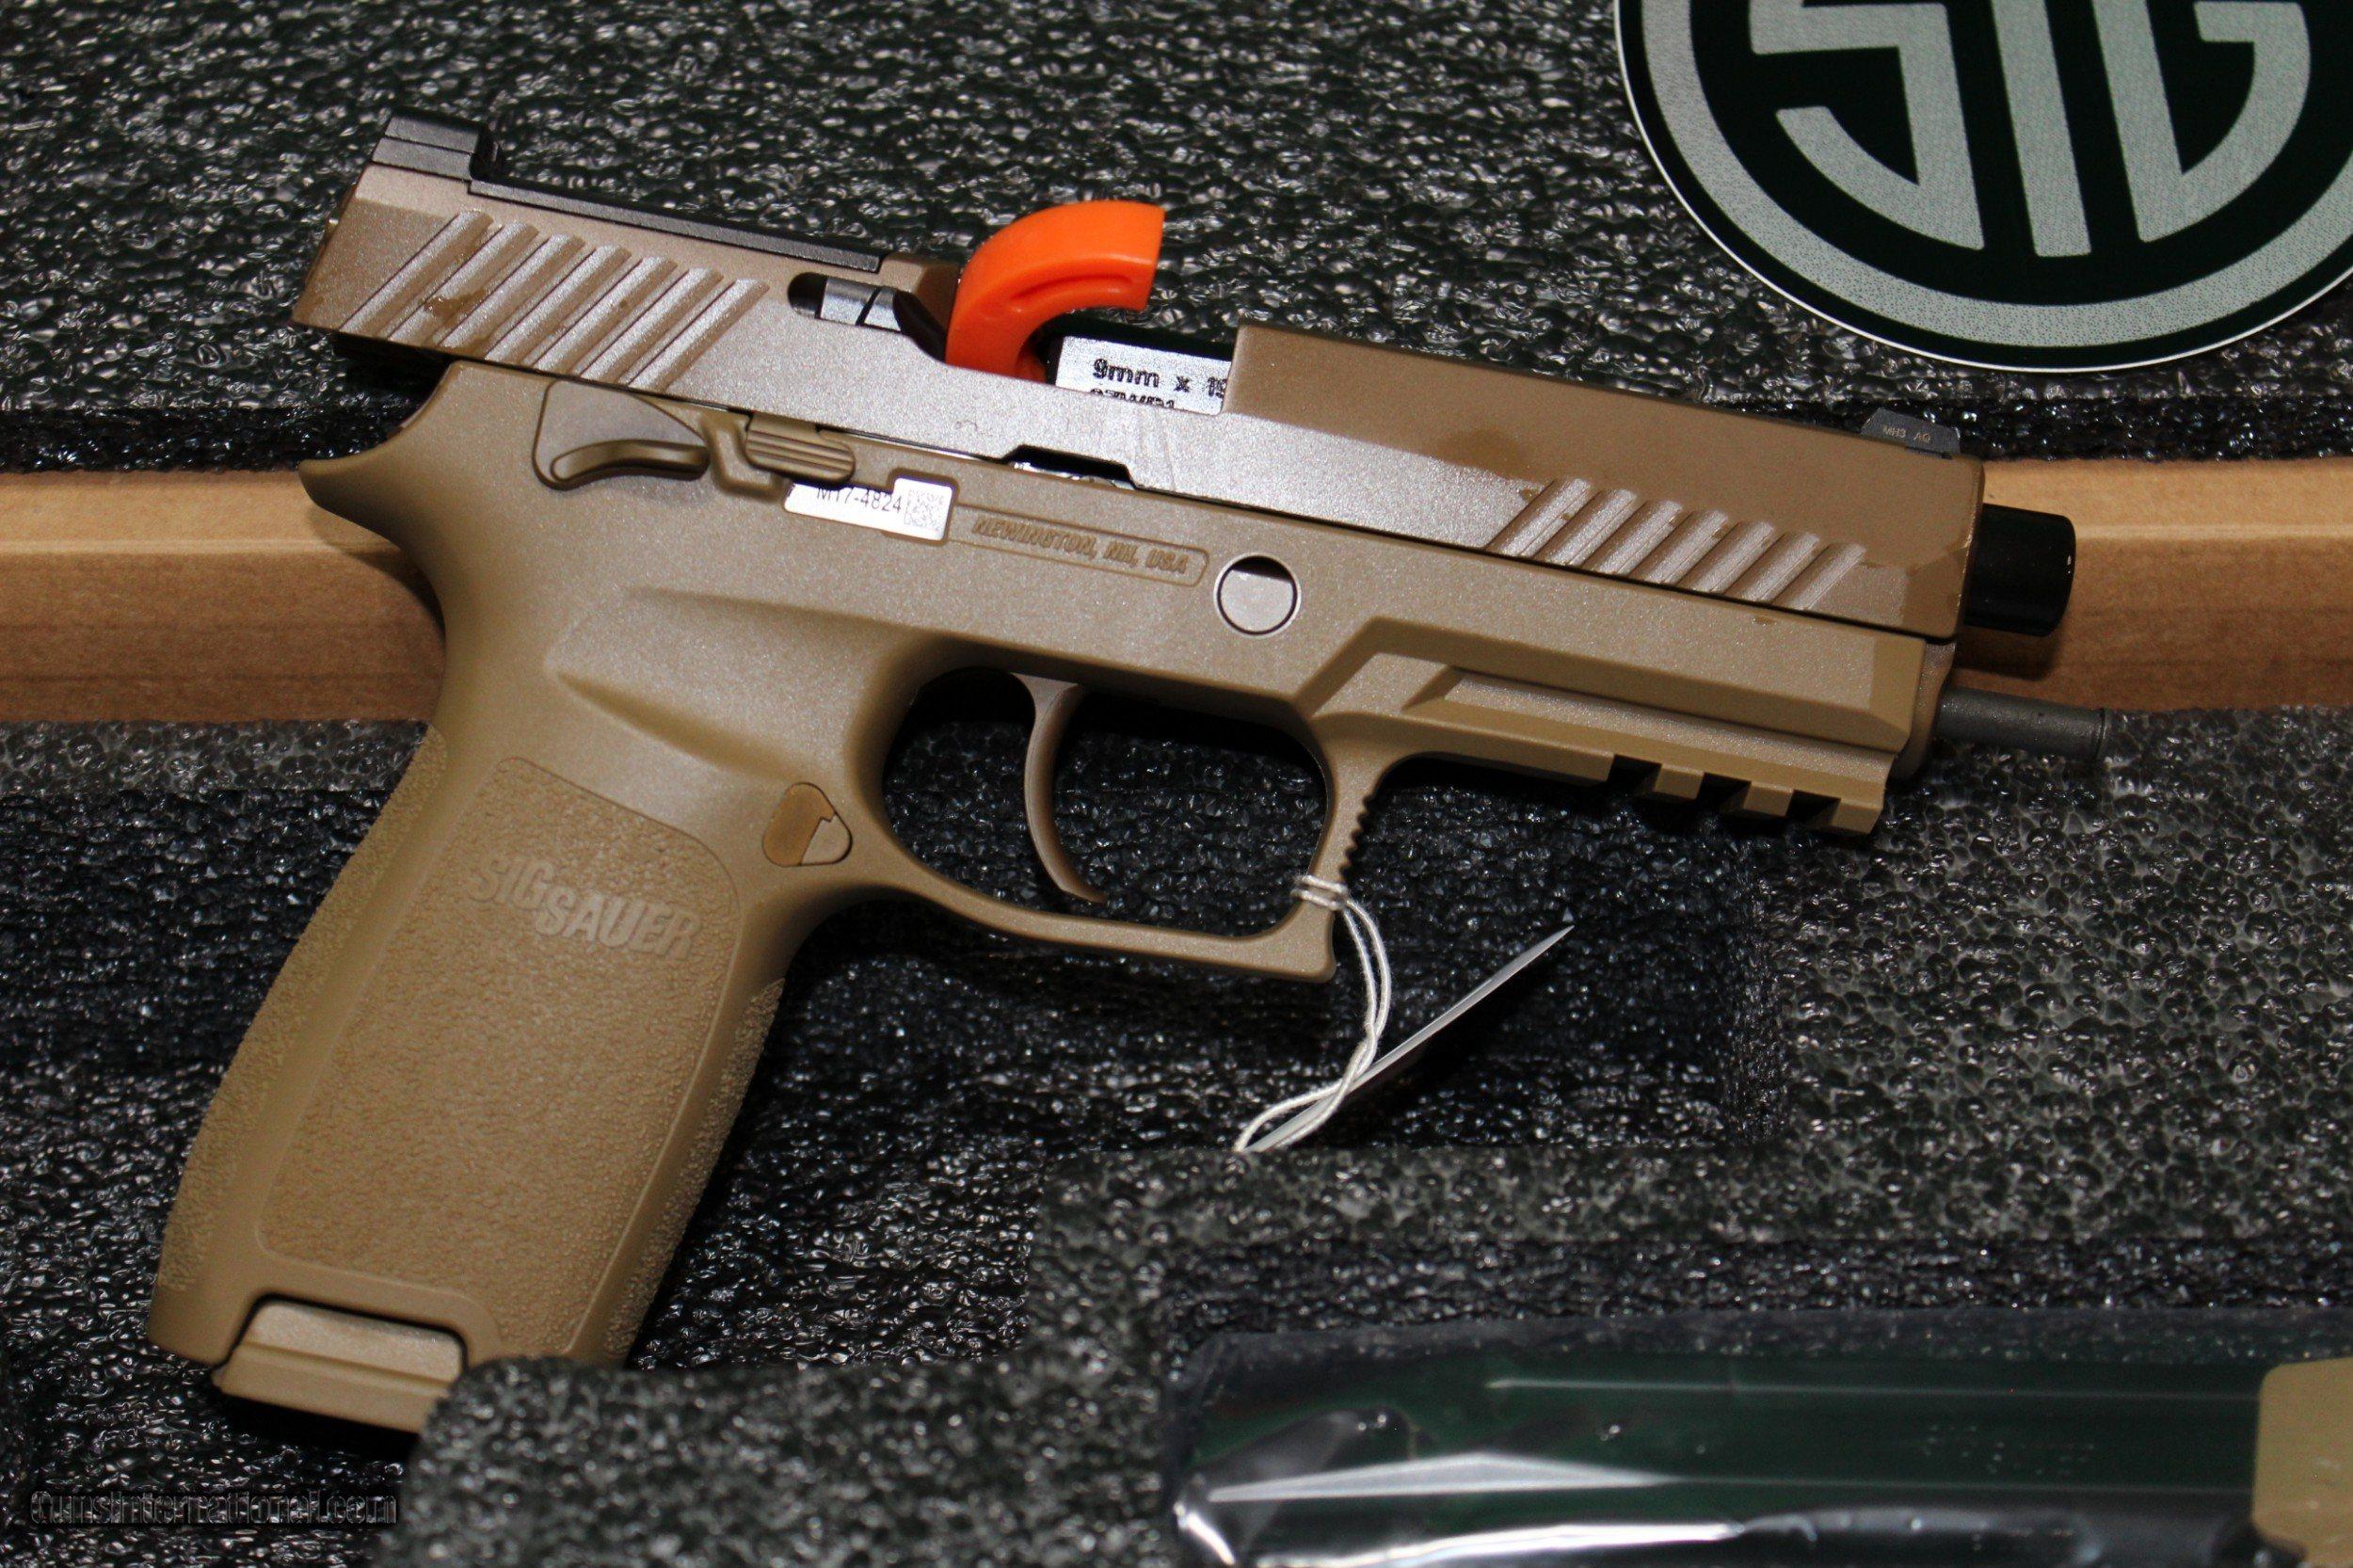 Sig Sauer M17 Commemorative NIB 9mm Luger Limited Edition